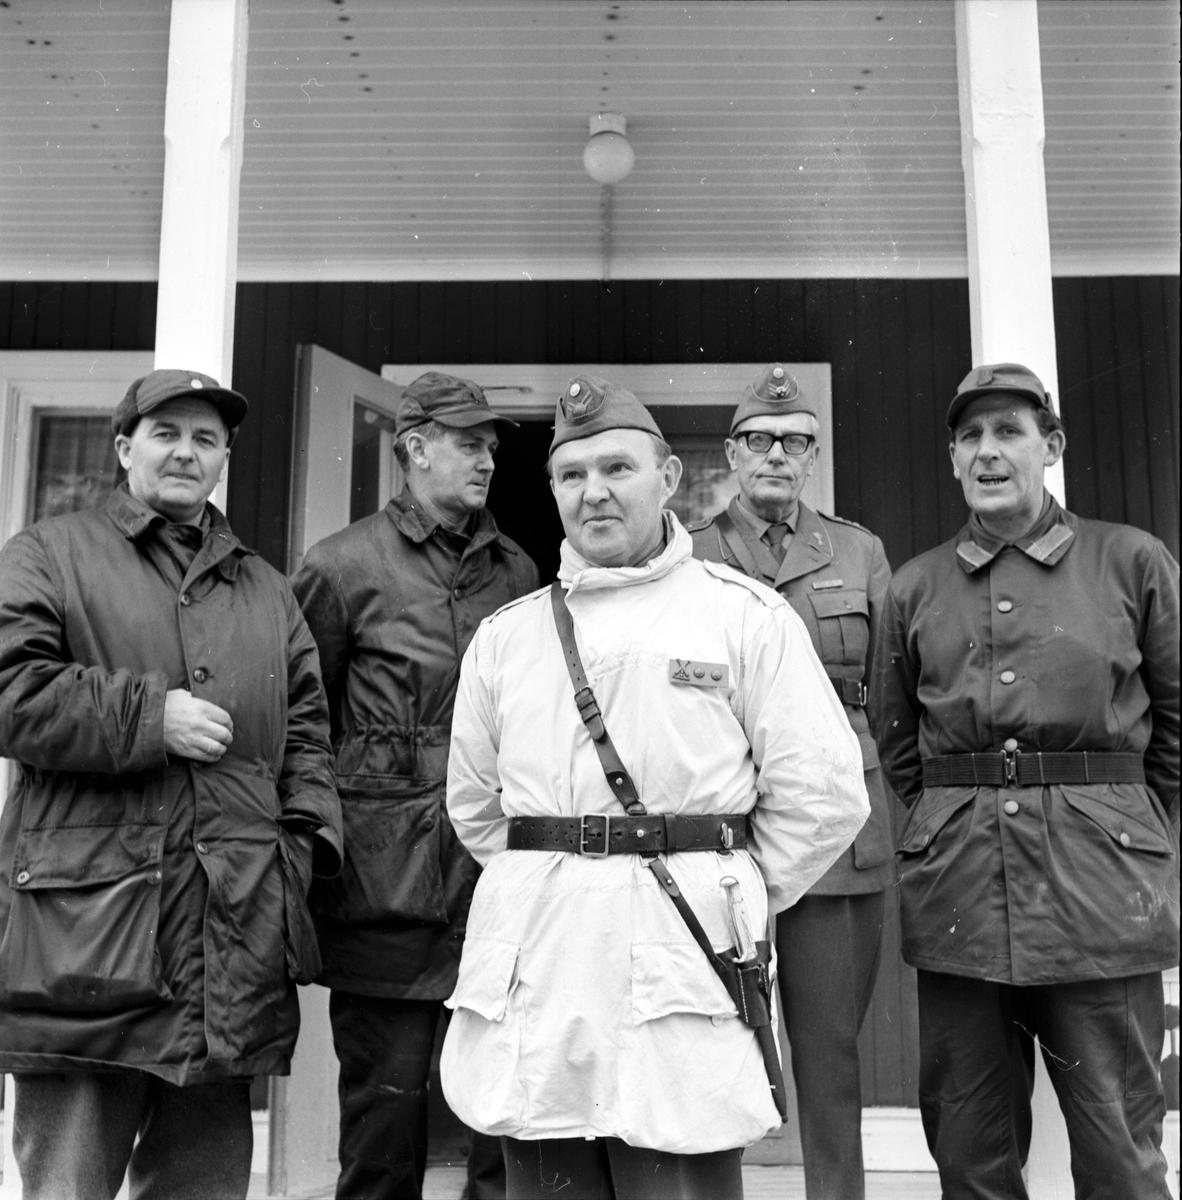 Stagården,Nygården, Ankarcrona,Westerlund, 17 Februari 1967